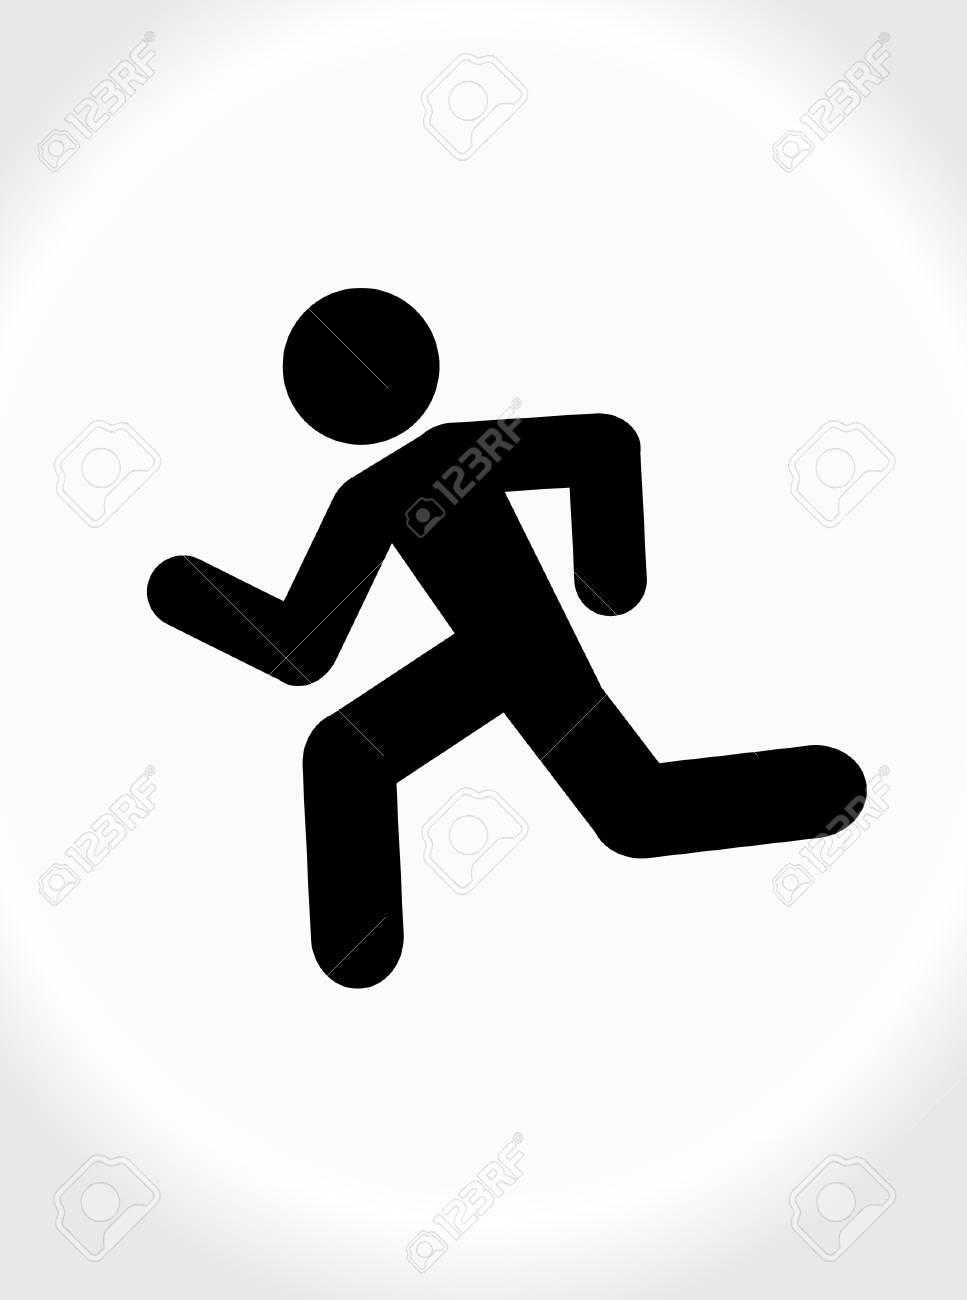 Running Man Icon Background Royalty Free Klipartlar Vektör çizimler